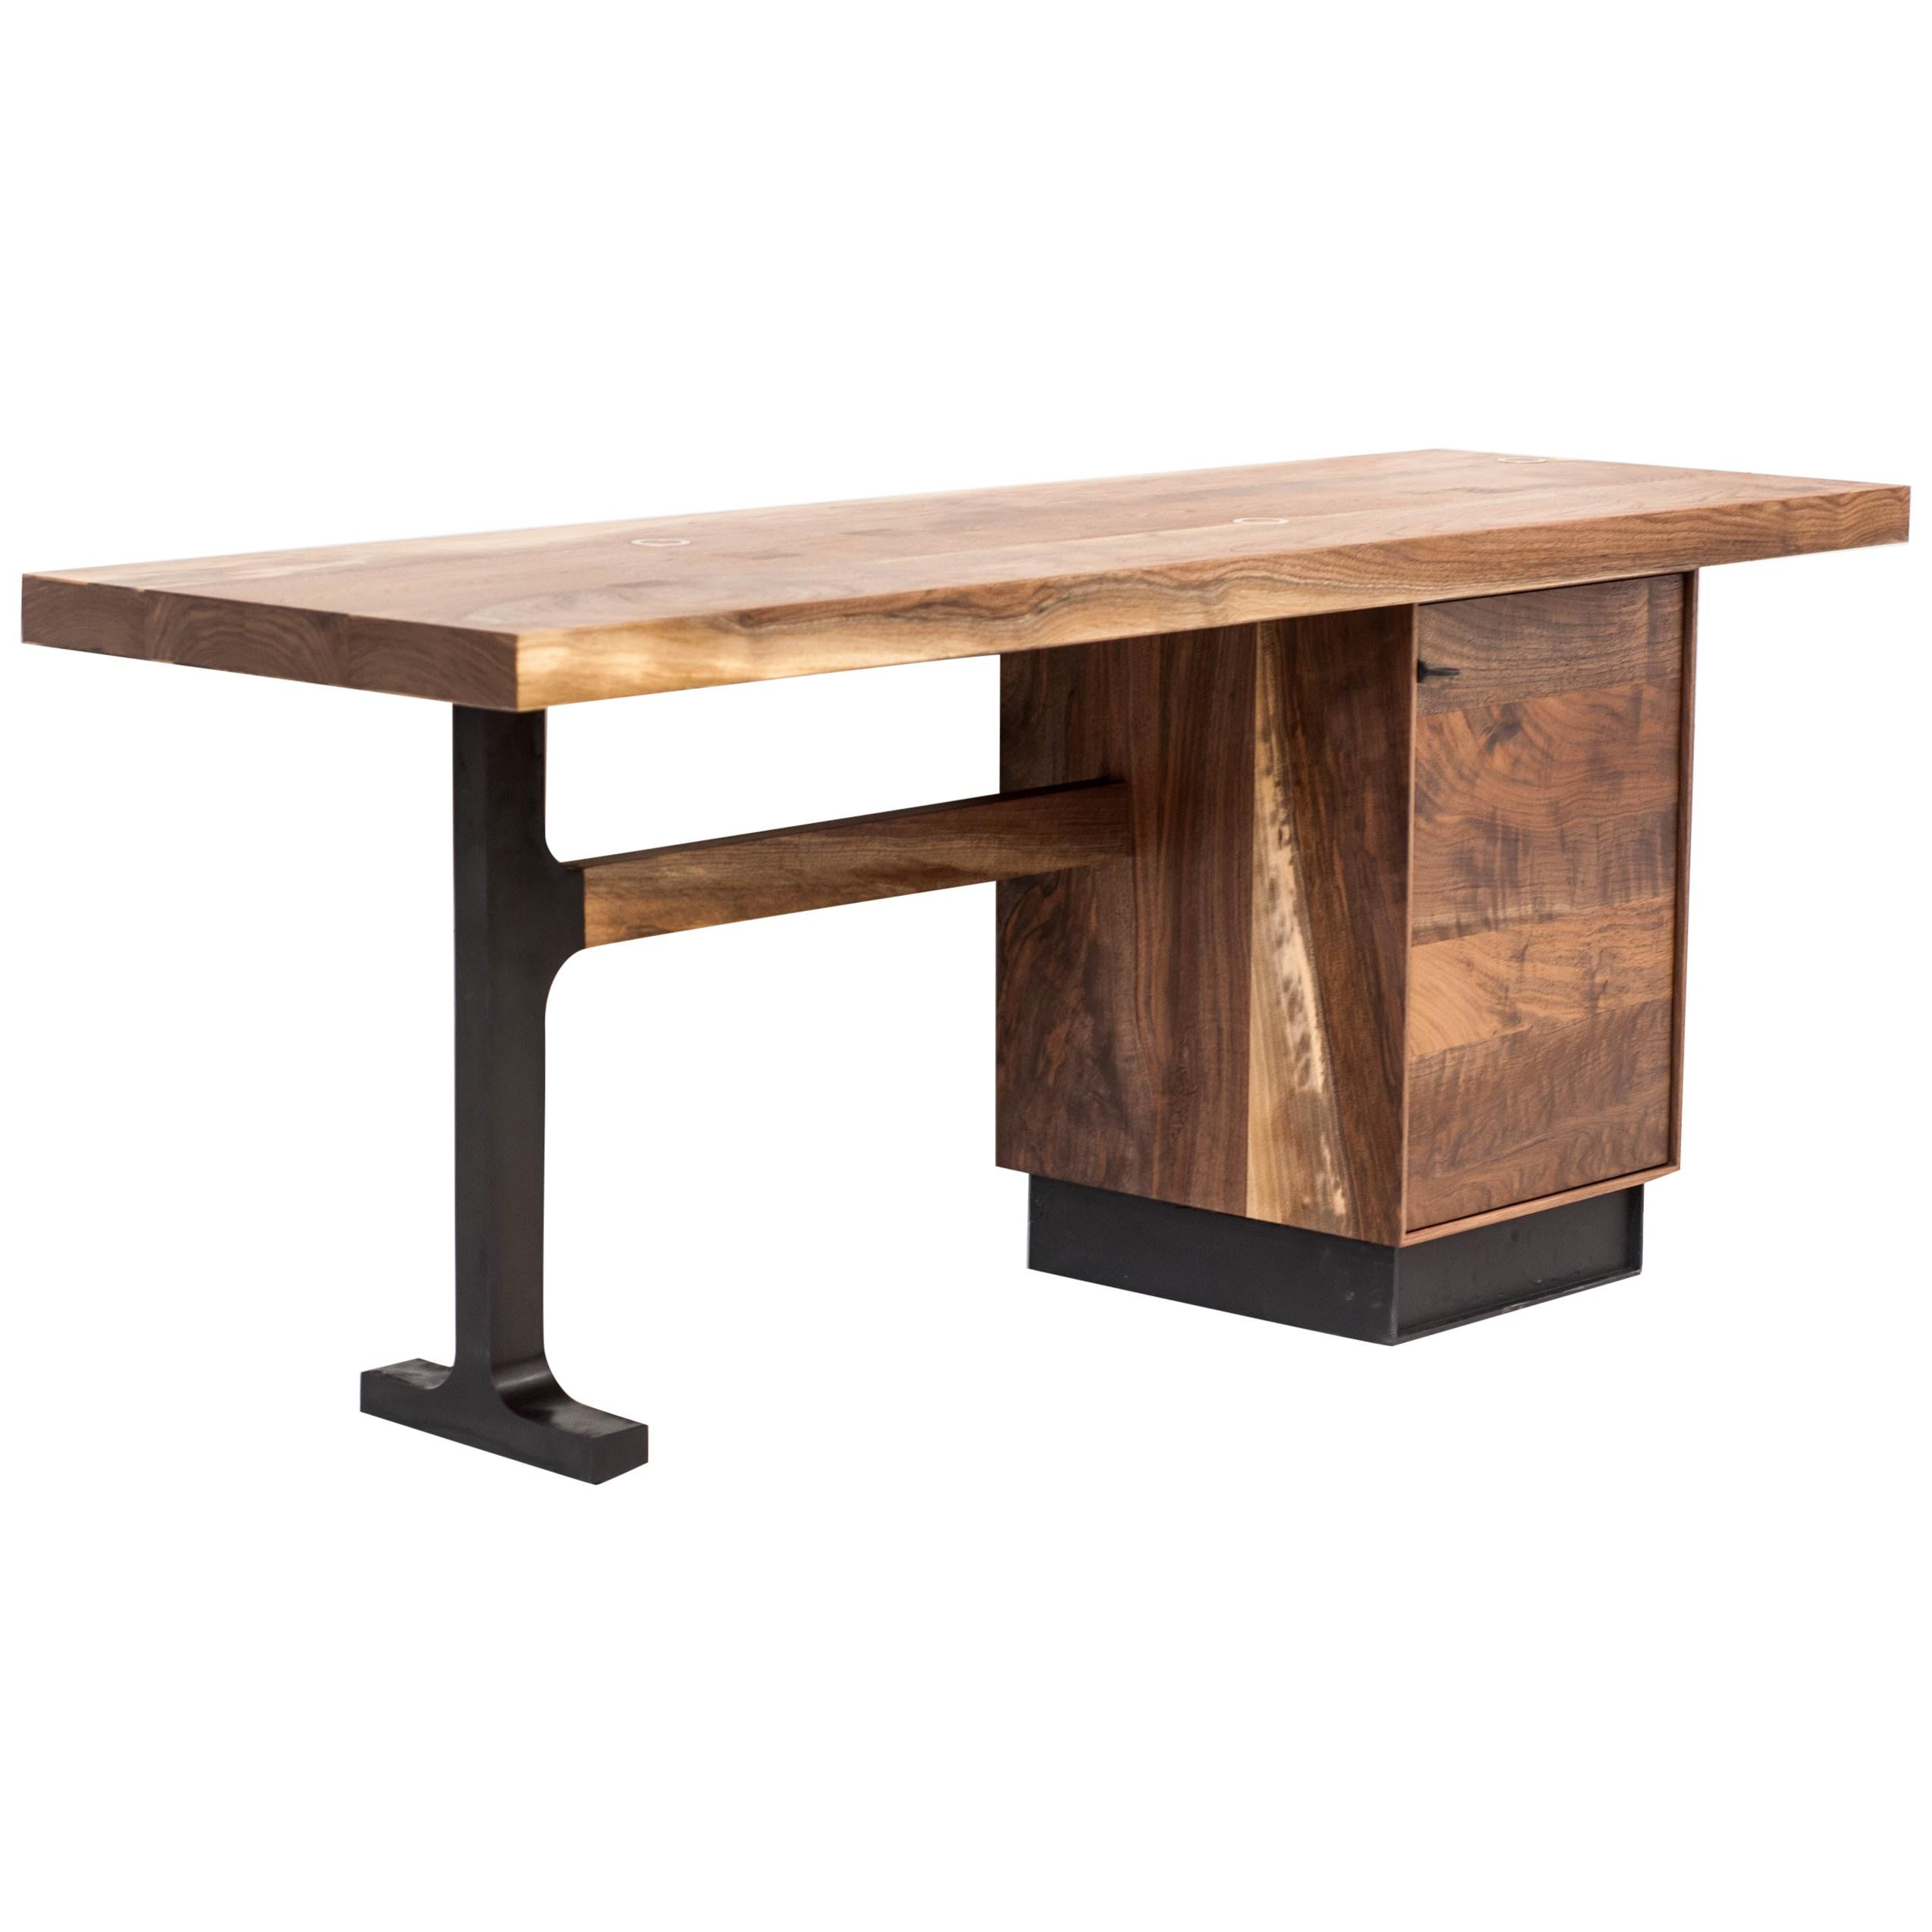 Jeff Martin Joinery Shaker Desk in Claro Walnut and Cast Bronze